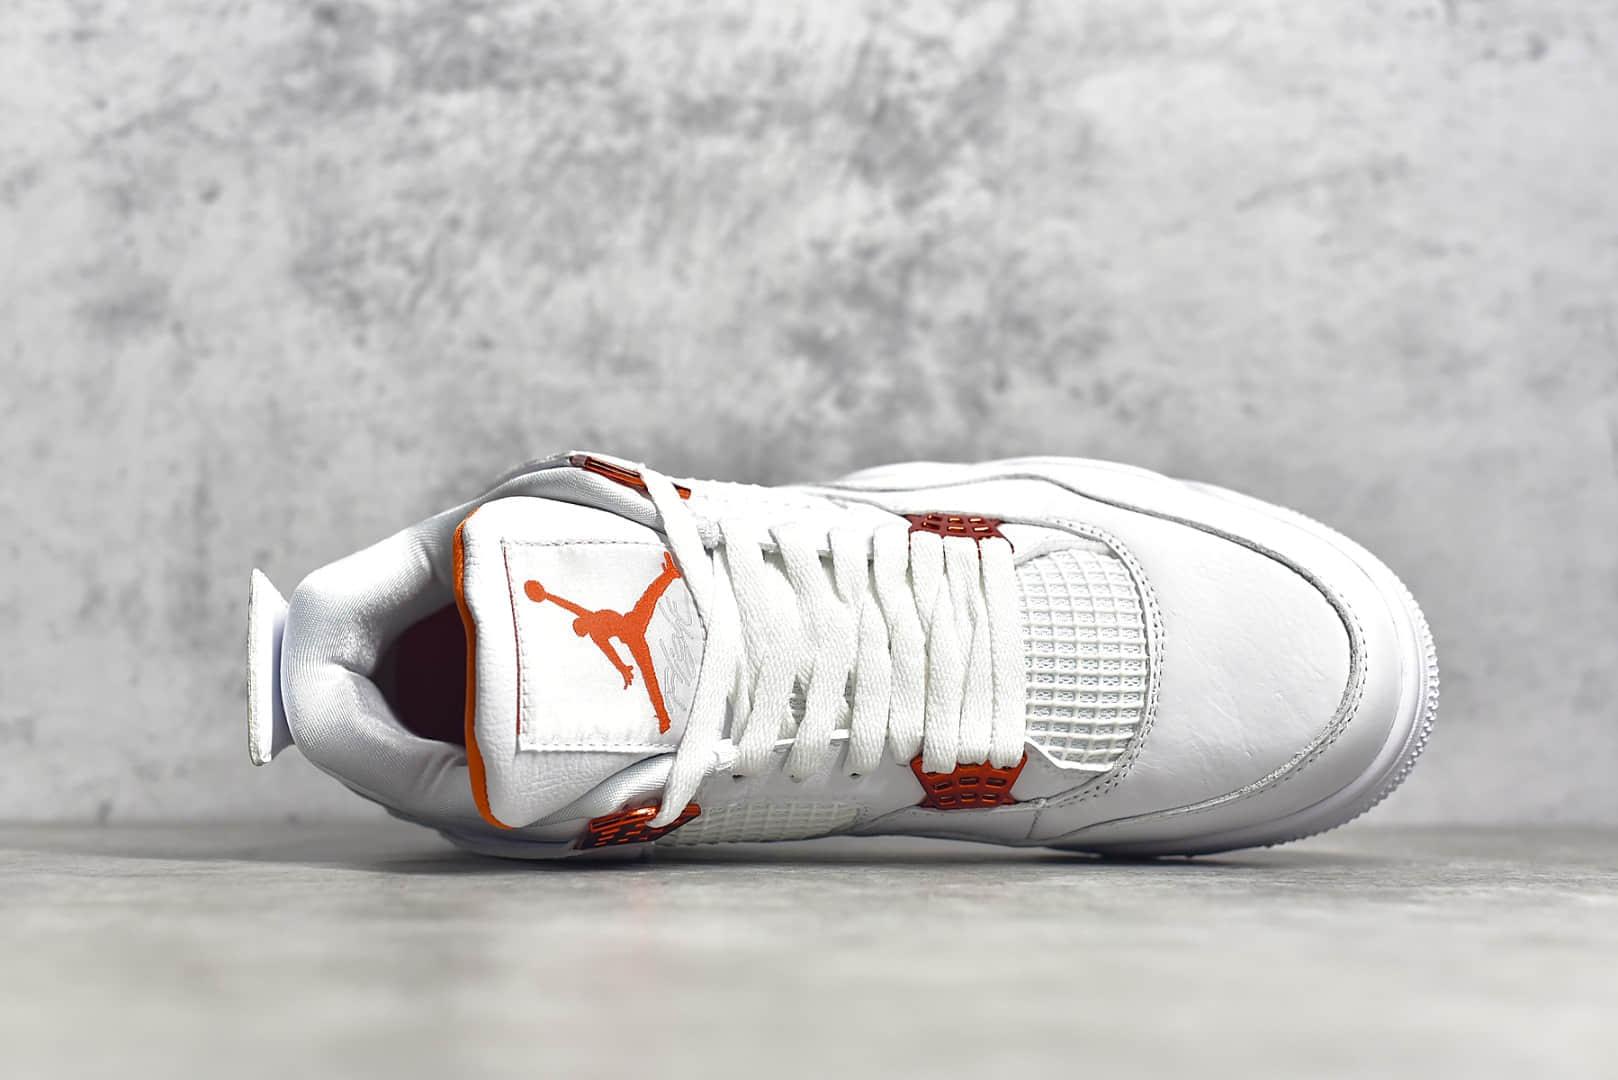 AJ4白橙高帮实战球鞋 Air Jordan 4 RETRO SE 金属橙 莆田最高版本AJ 货号:CT8527-113-潮流者之家